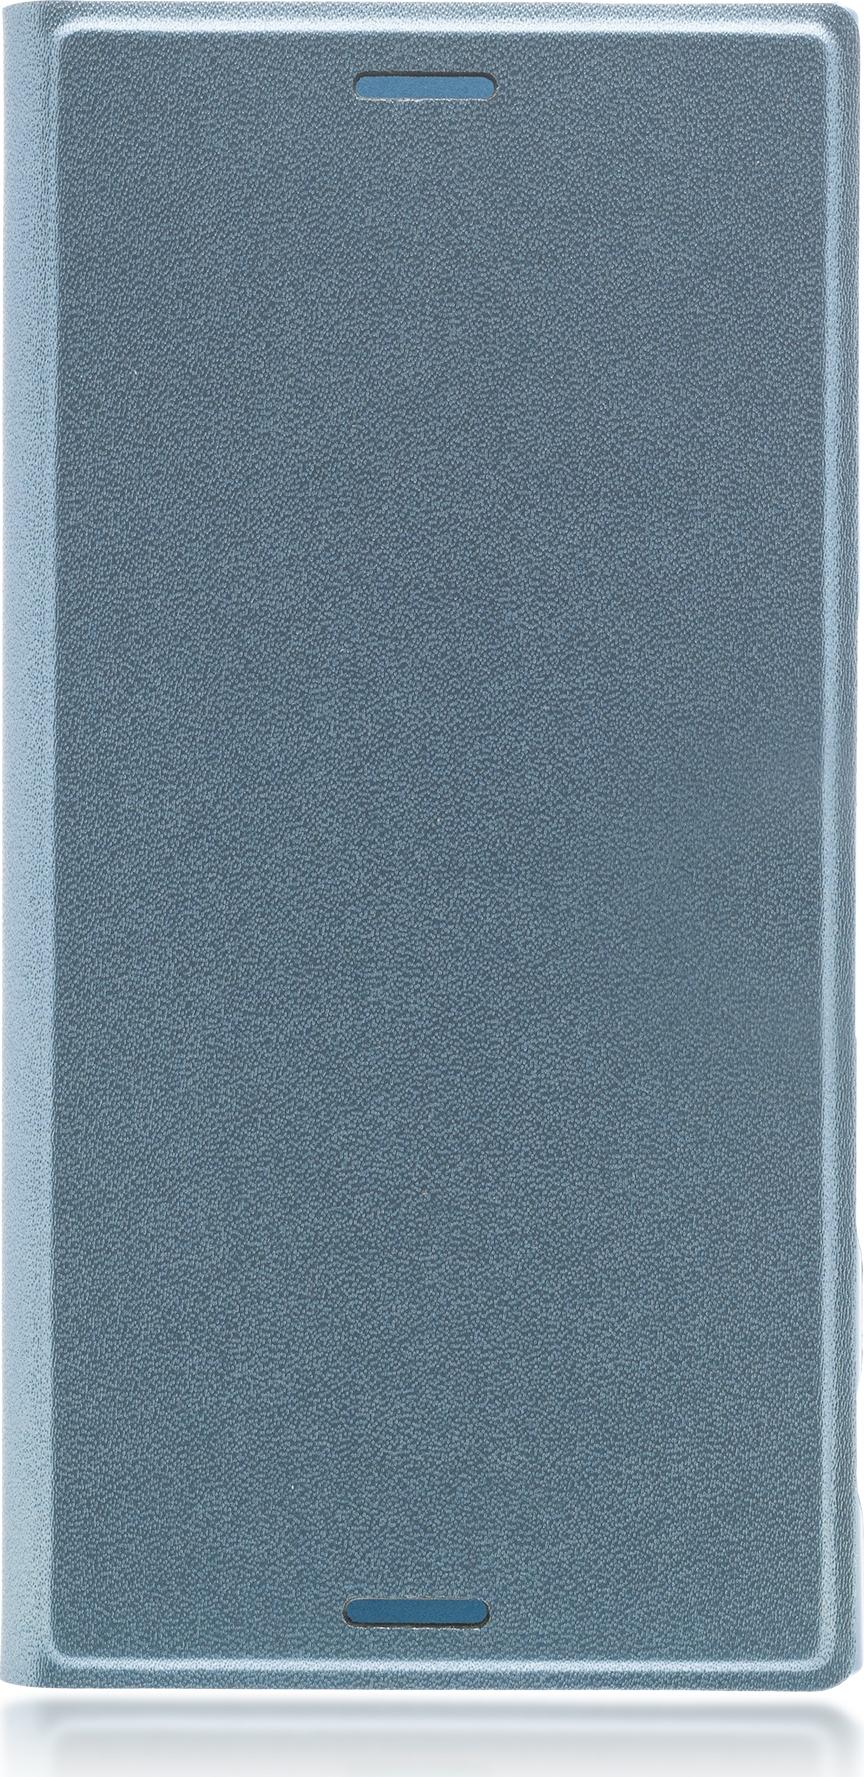 Чехол Brosco Book для Sony Xperia XZs, голубой комплектующие и запчасти для ноутбуков sony tablet z2 sgp511 512 541 z1